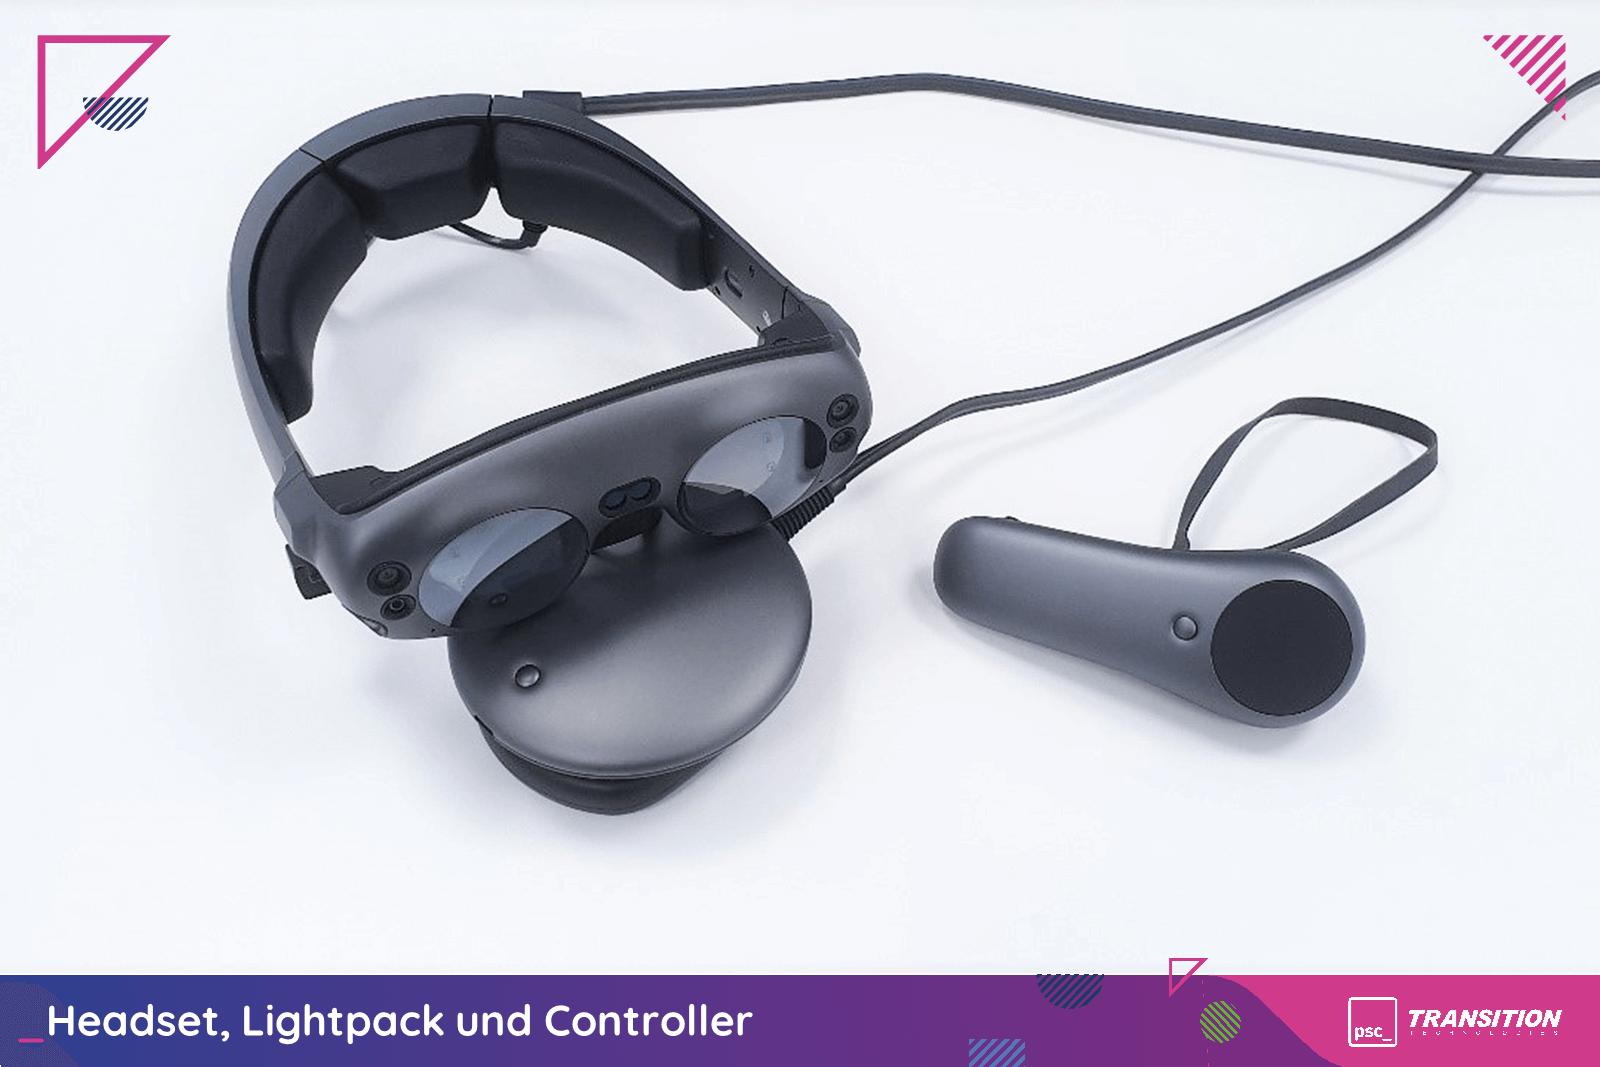 Headset, Lightpack und Controller